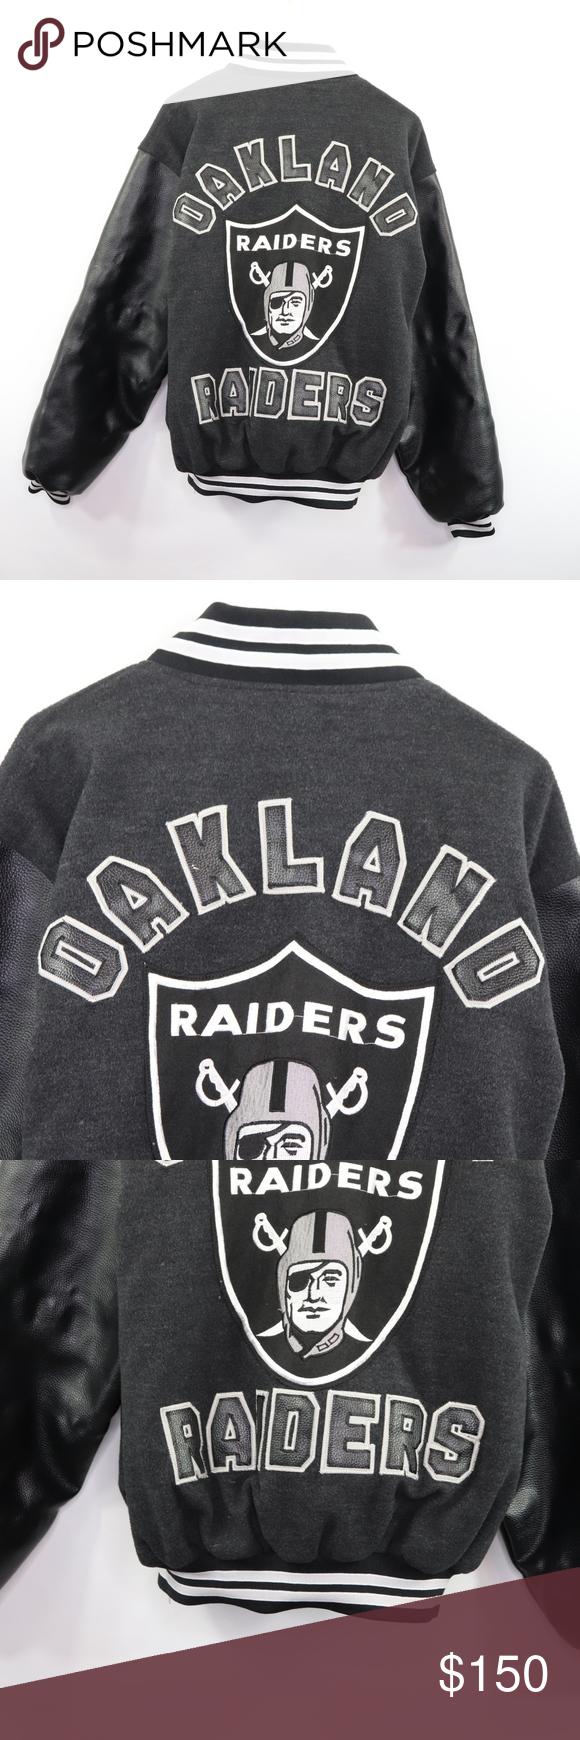 Oakland Raiders Mens Large Bomber Varsity Jacket Vintage Oakland Raiders Nfl Leather Varsity Jacket Jac Leather Varsity Jackets Varsity Jacket Vintage Jacket [ 1740 x 580 Pixel ]